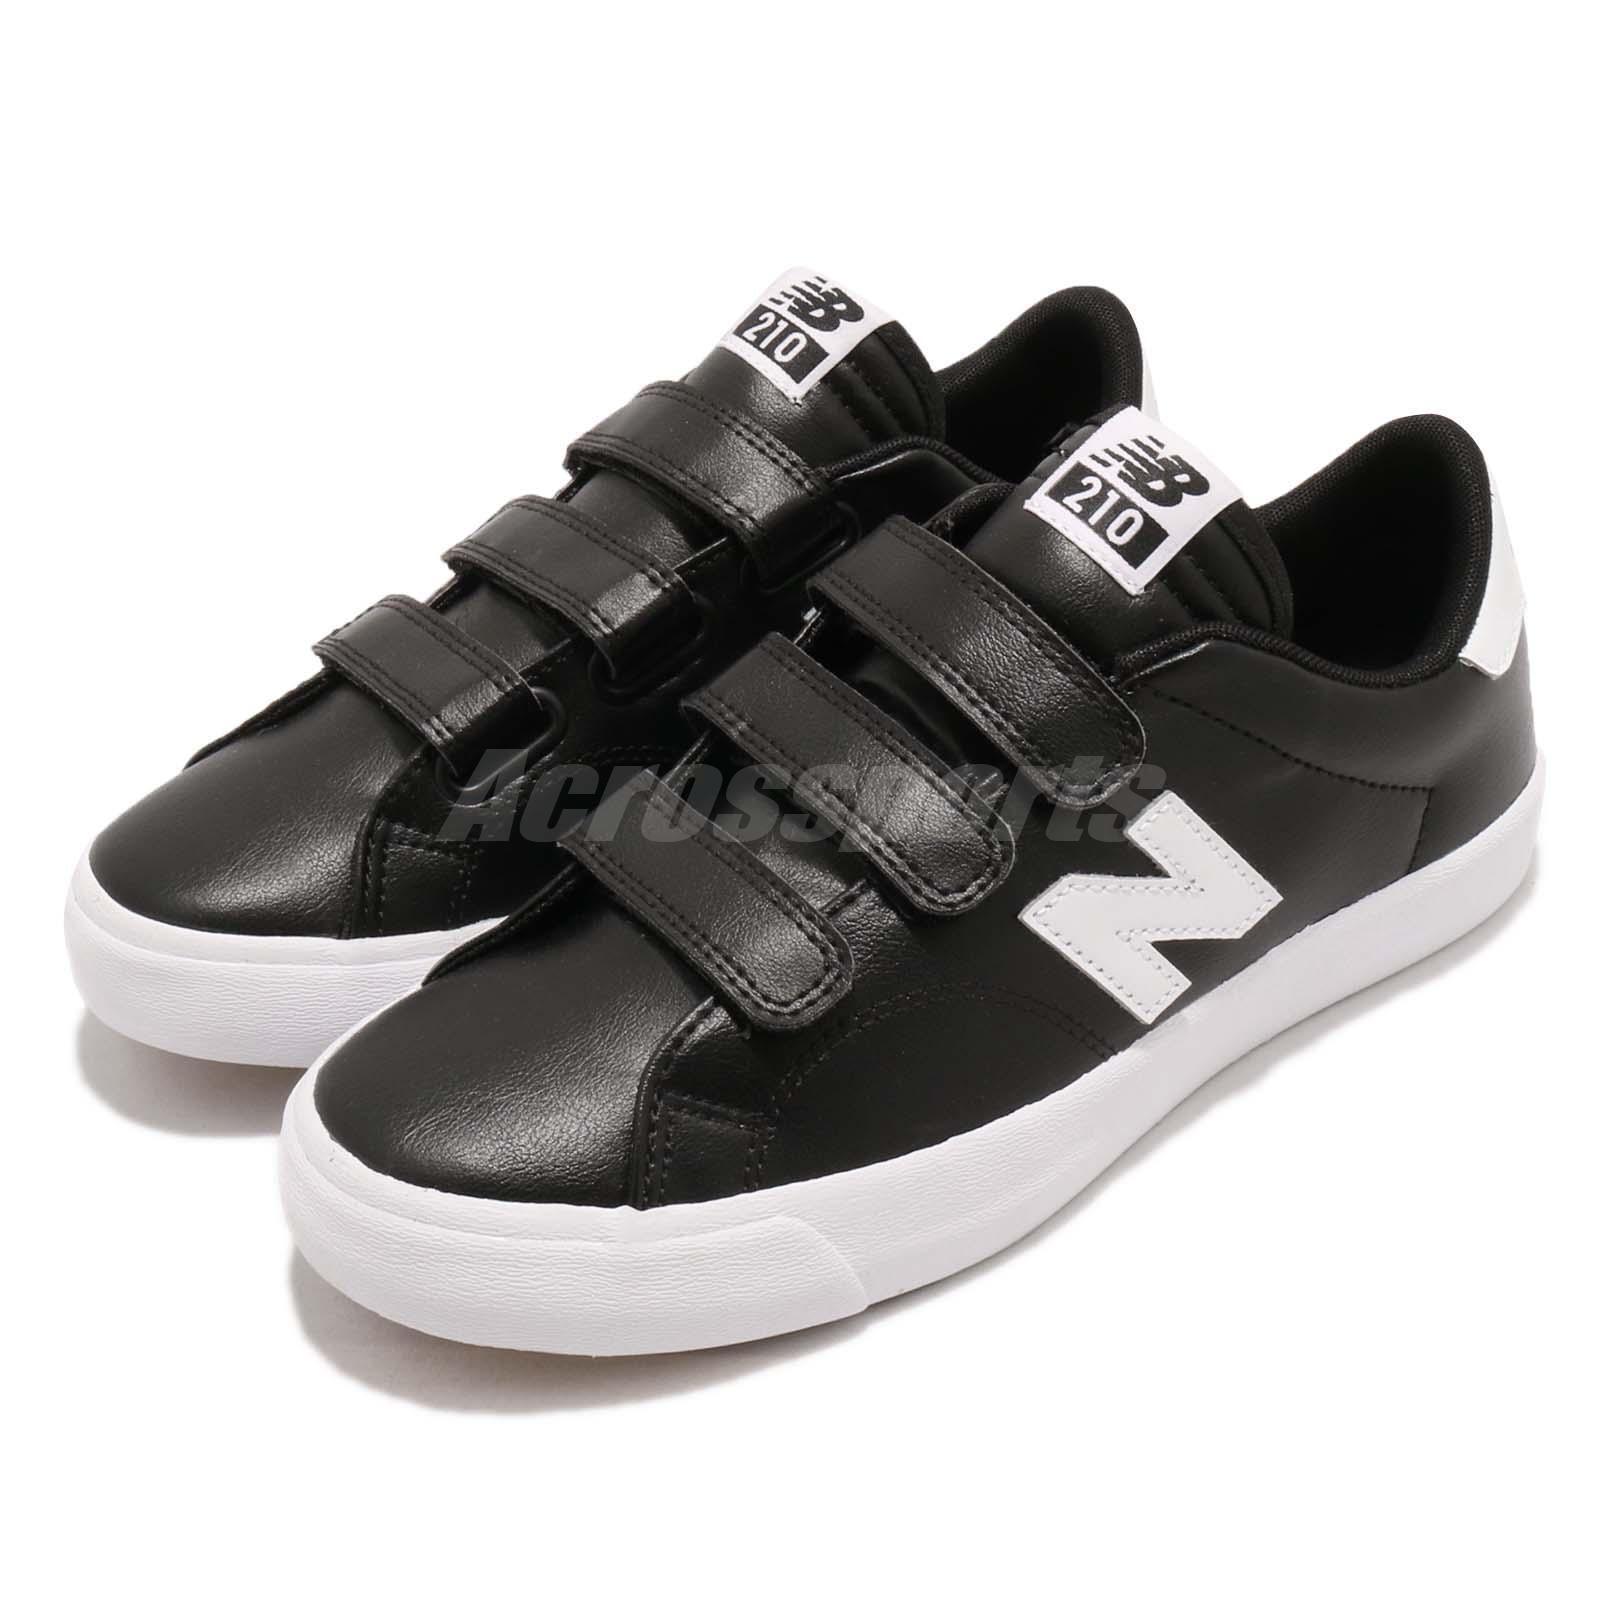 New Balance AM210VBK D noir blanc homme Femme Casual chaussures Sneakers AM210VBKD